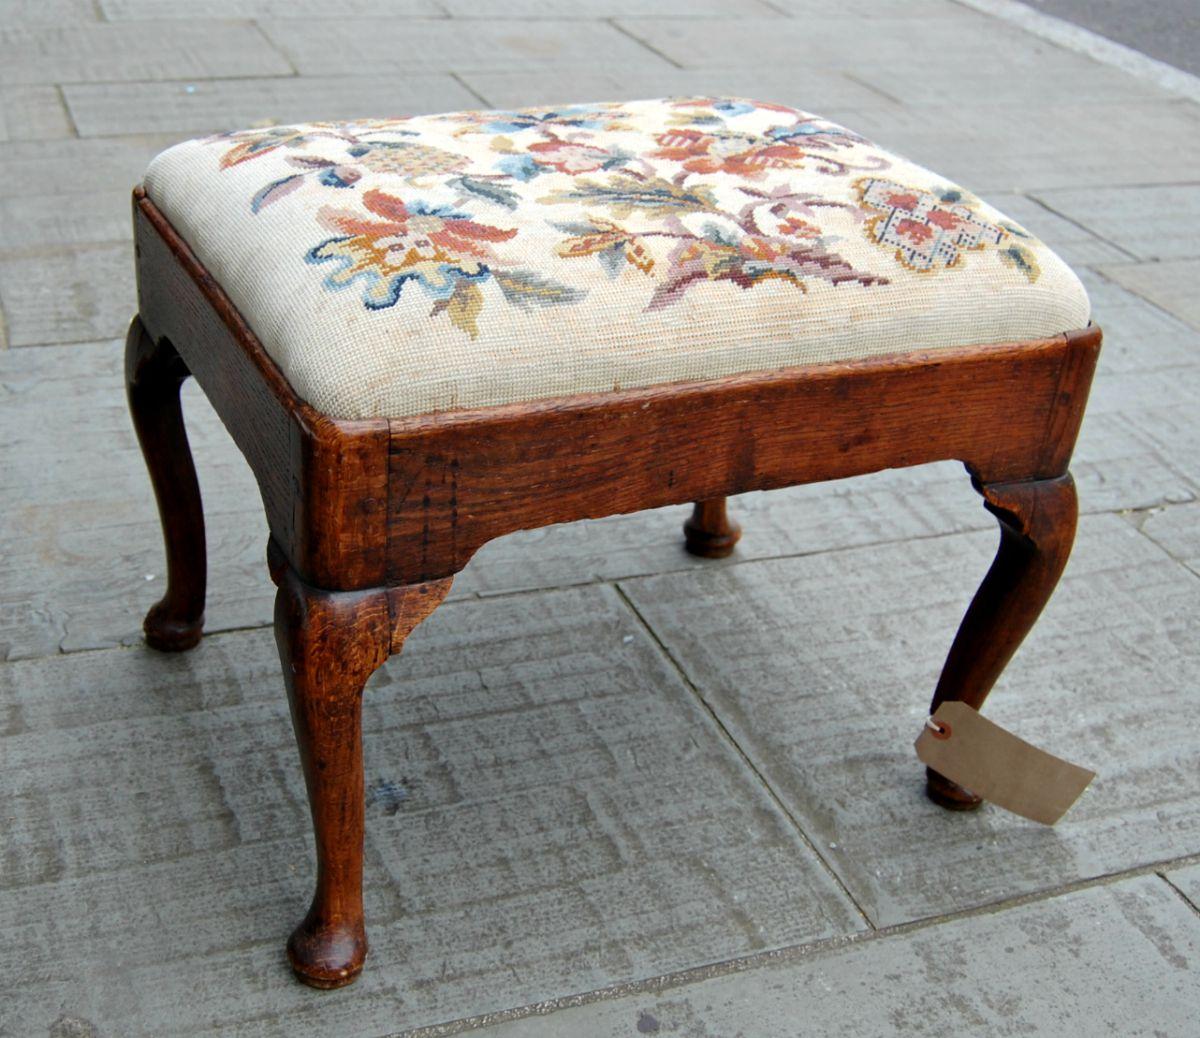 b stool 1